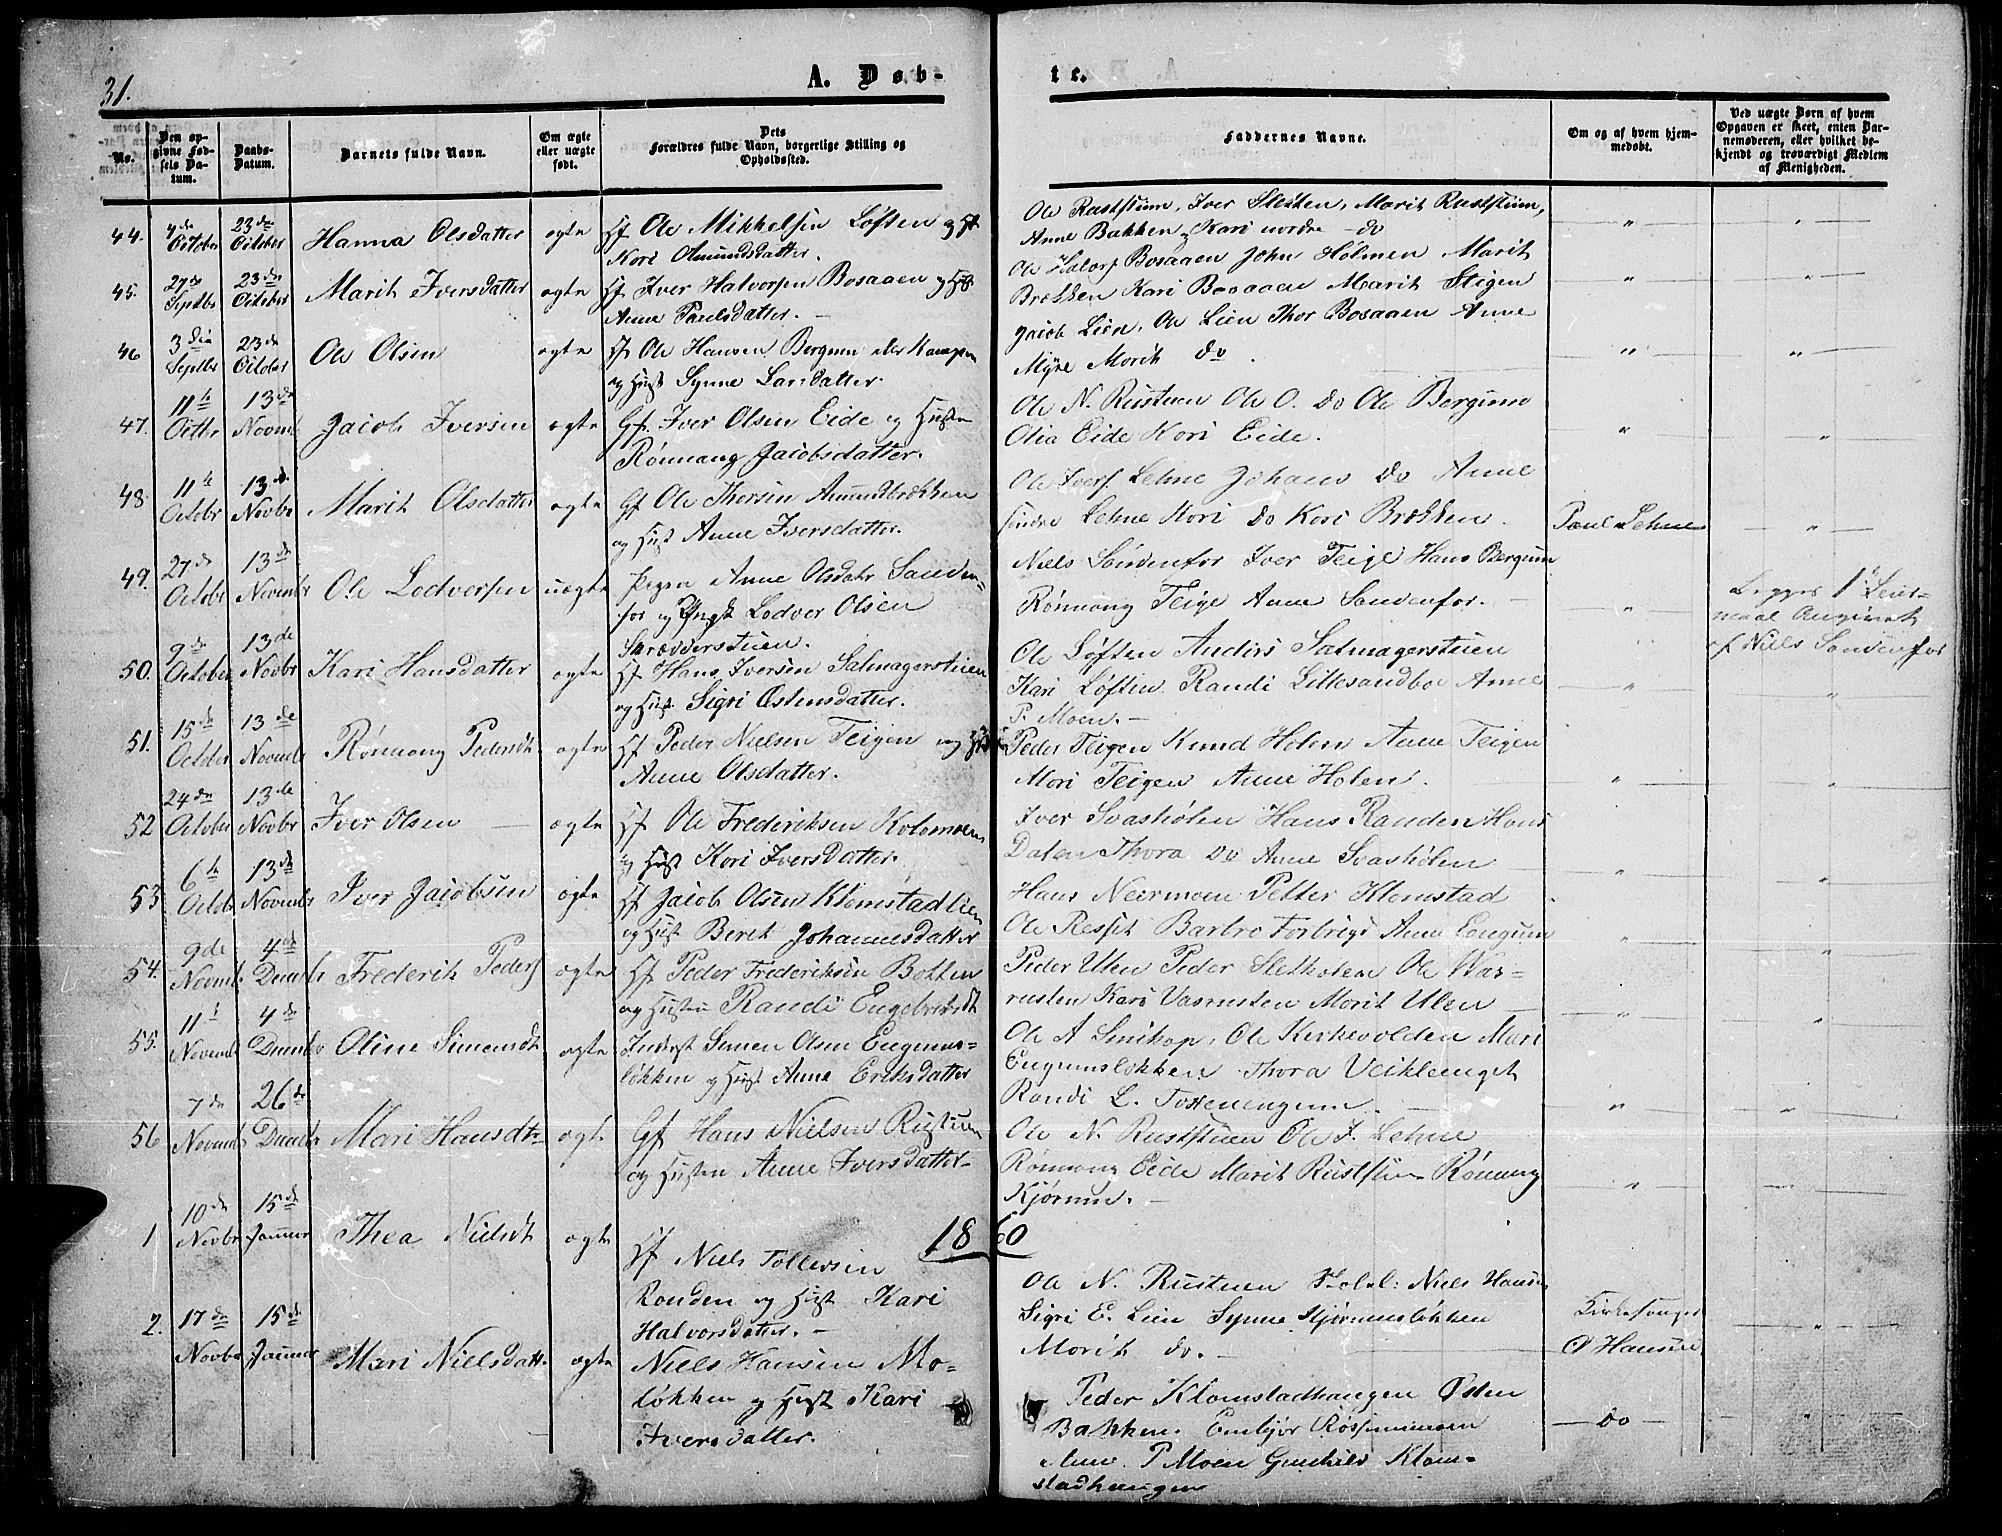 SAH, Nord-Fron prestekontor, Klokkerbok nr. 3, 1851-1886, s. 31